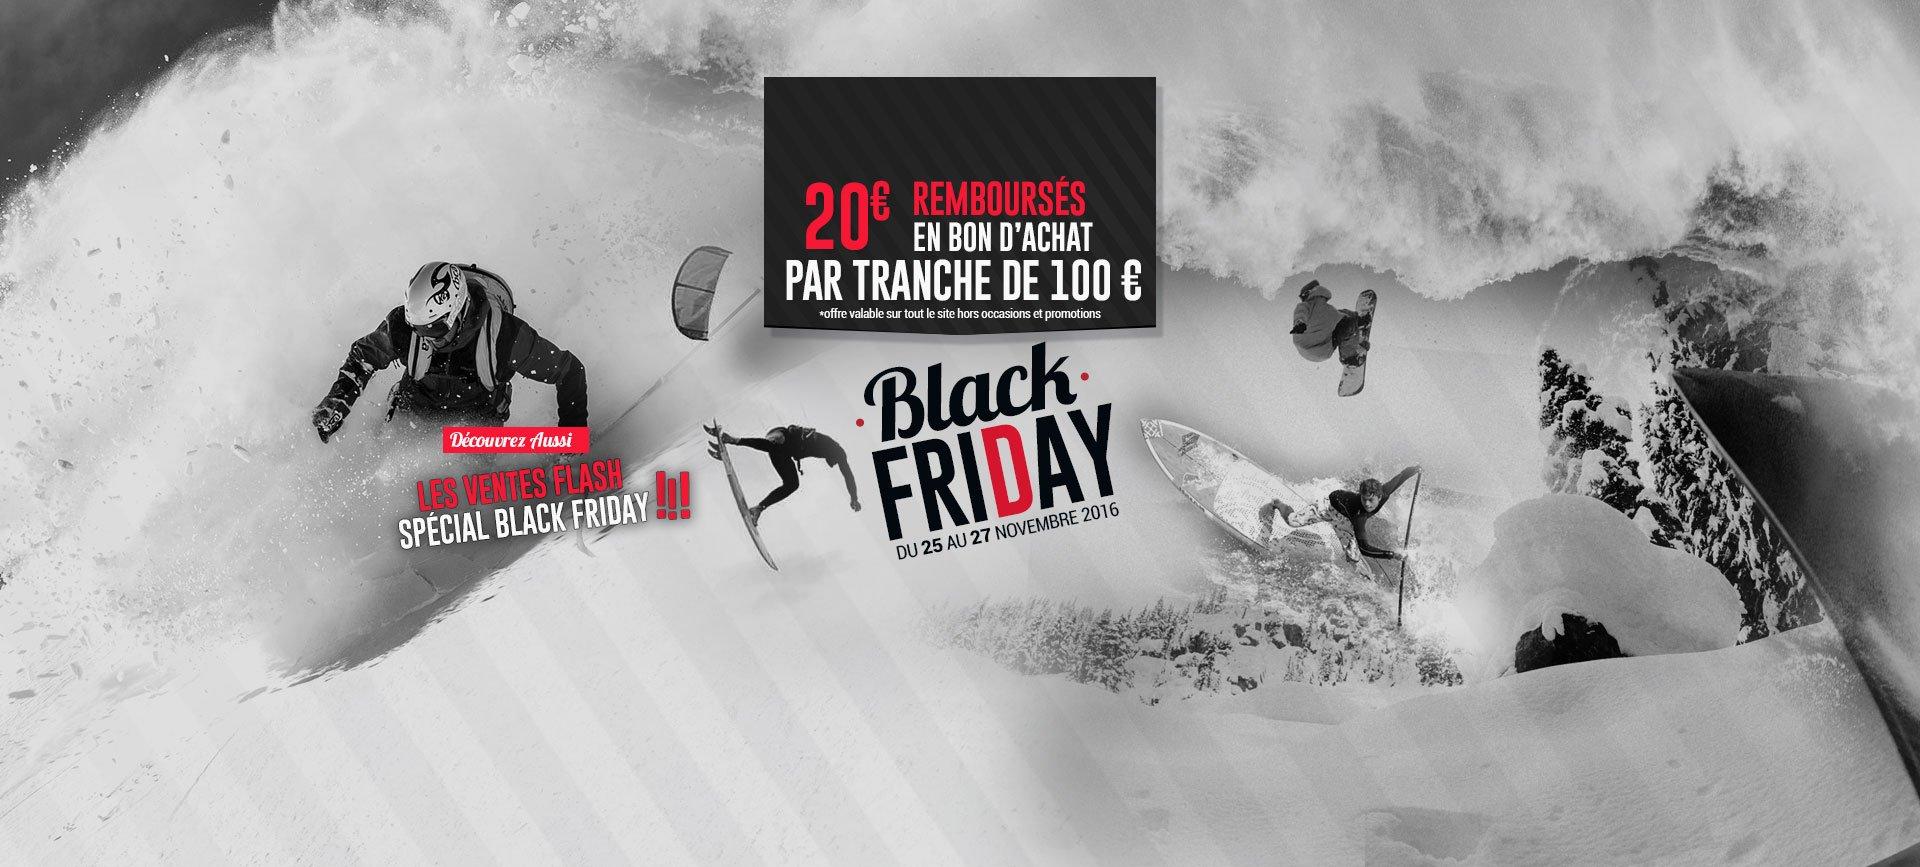 Black Friday 2016 chez Freeride-attitude